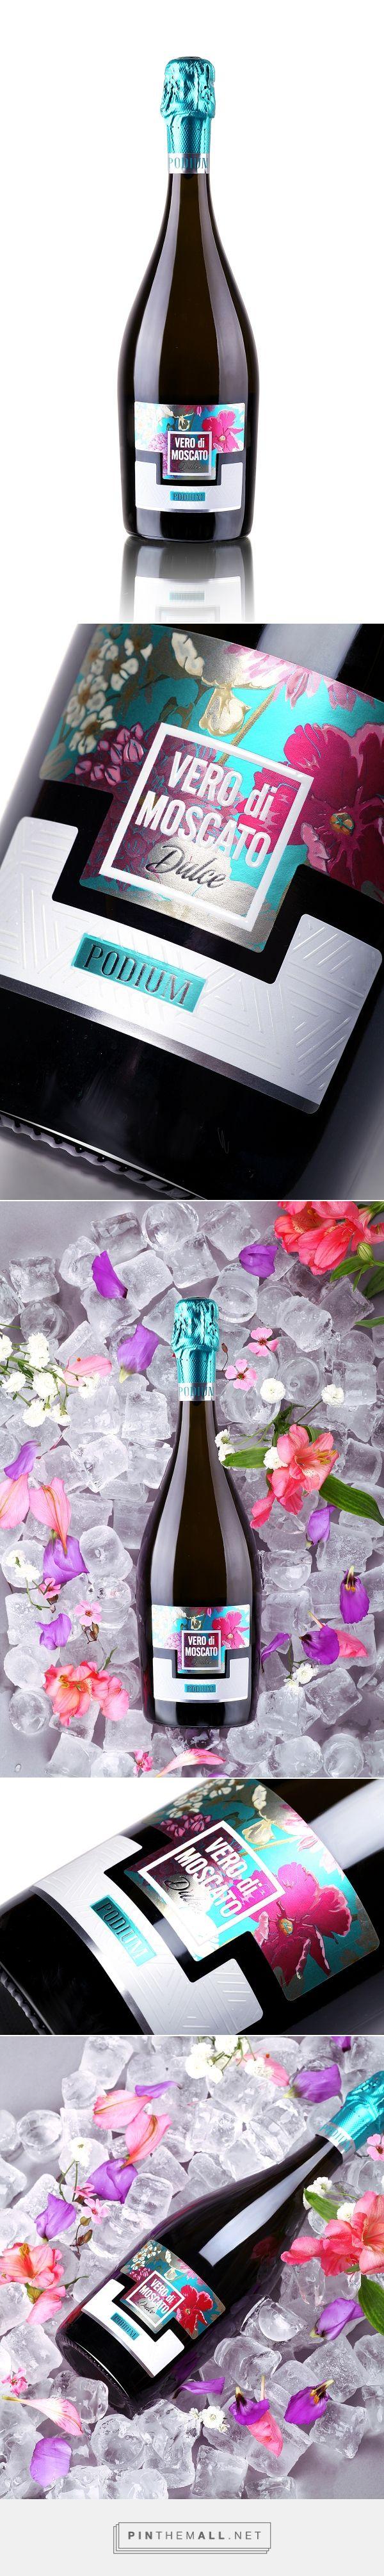 Vero di Moscato Champagne Packaging by 43oz Design Studio   Fivestar Branding – Design and Branding Agency & Inspiration Gallery